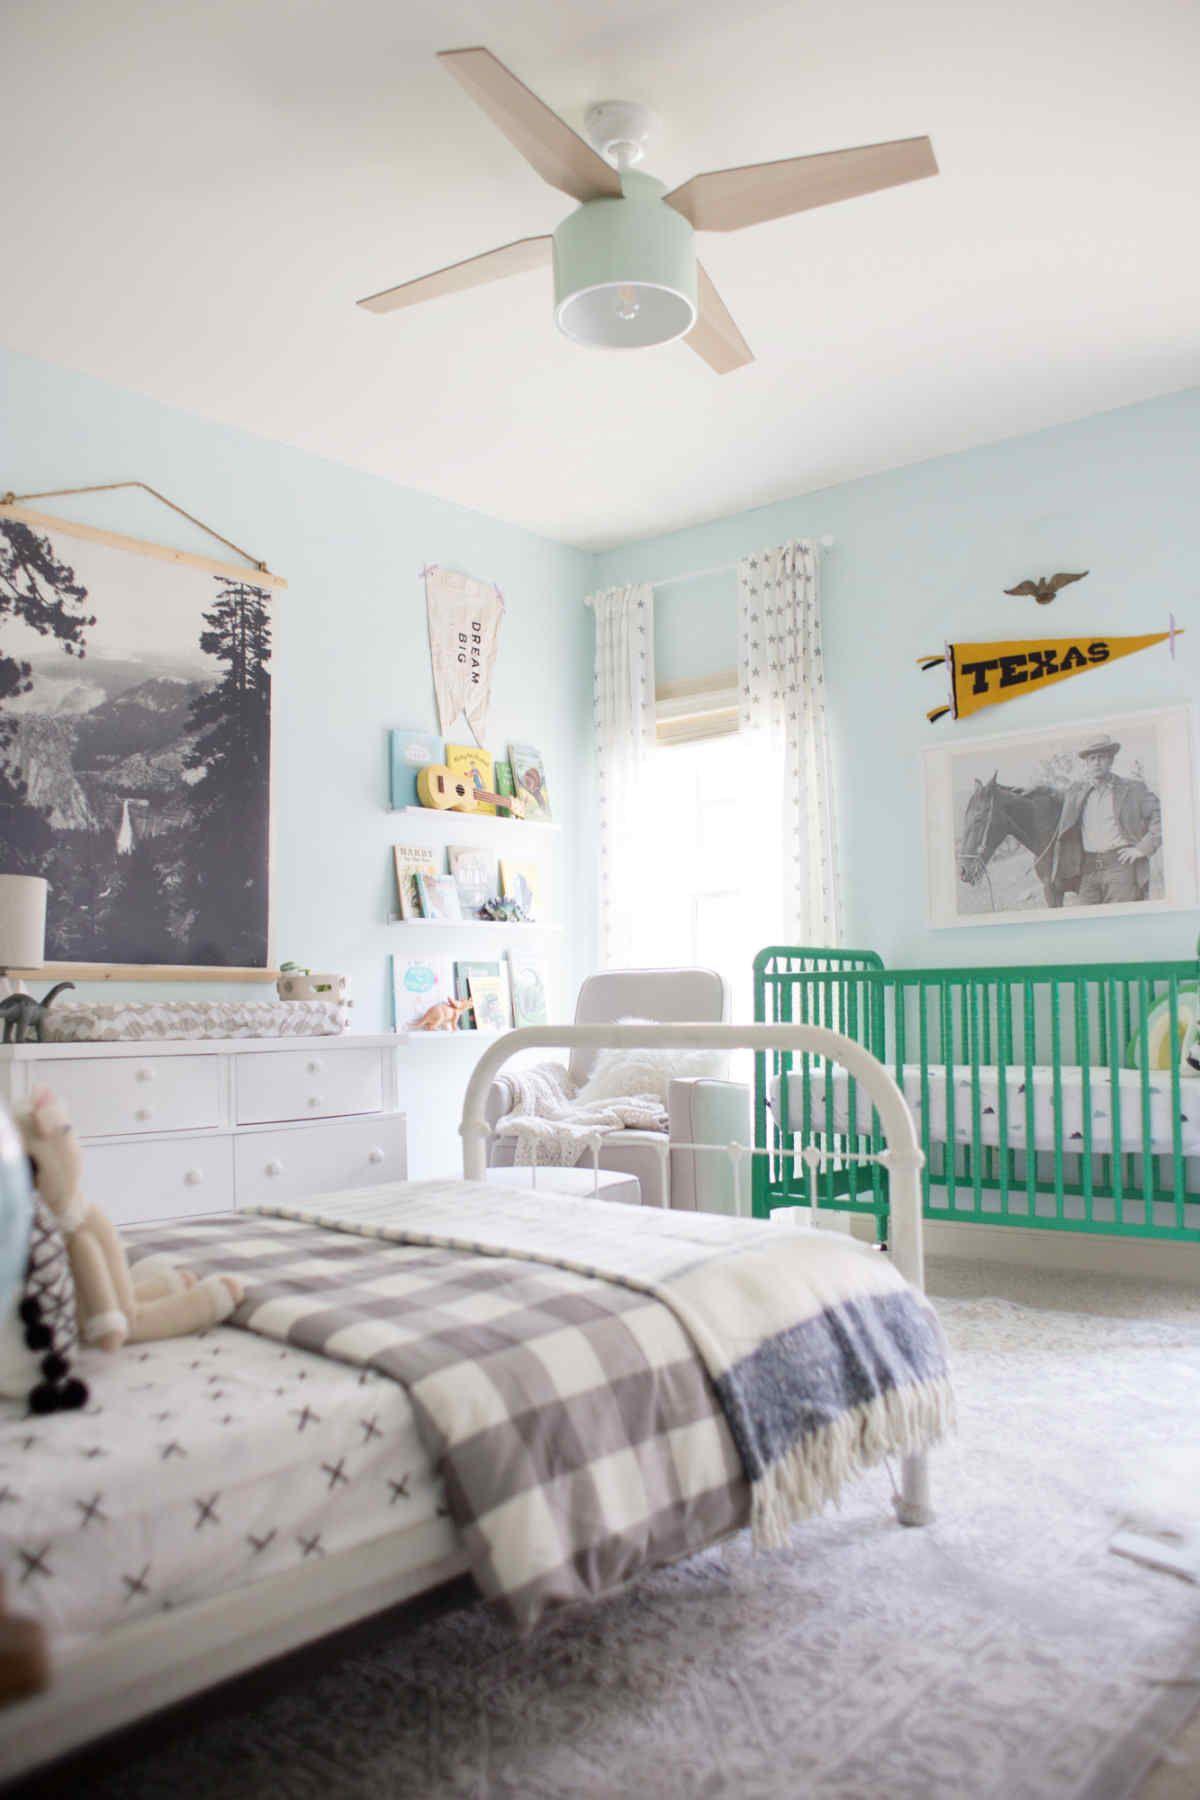 d Boy Room Ideas